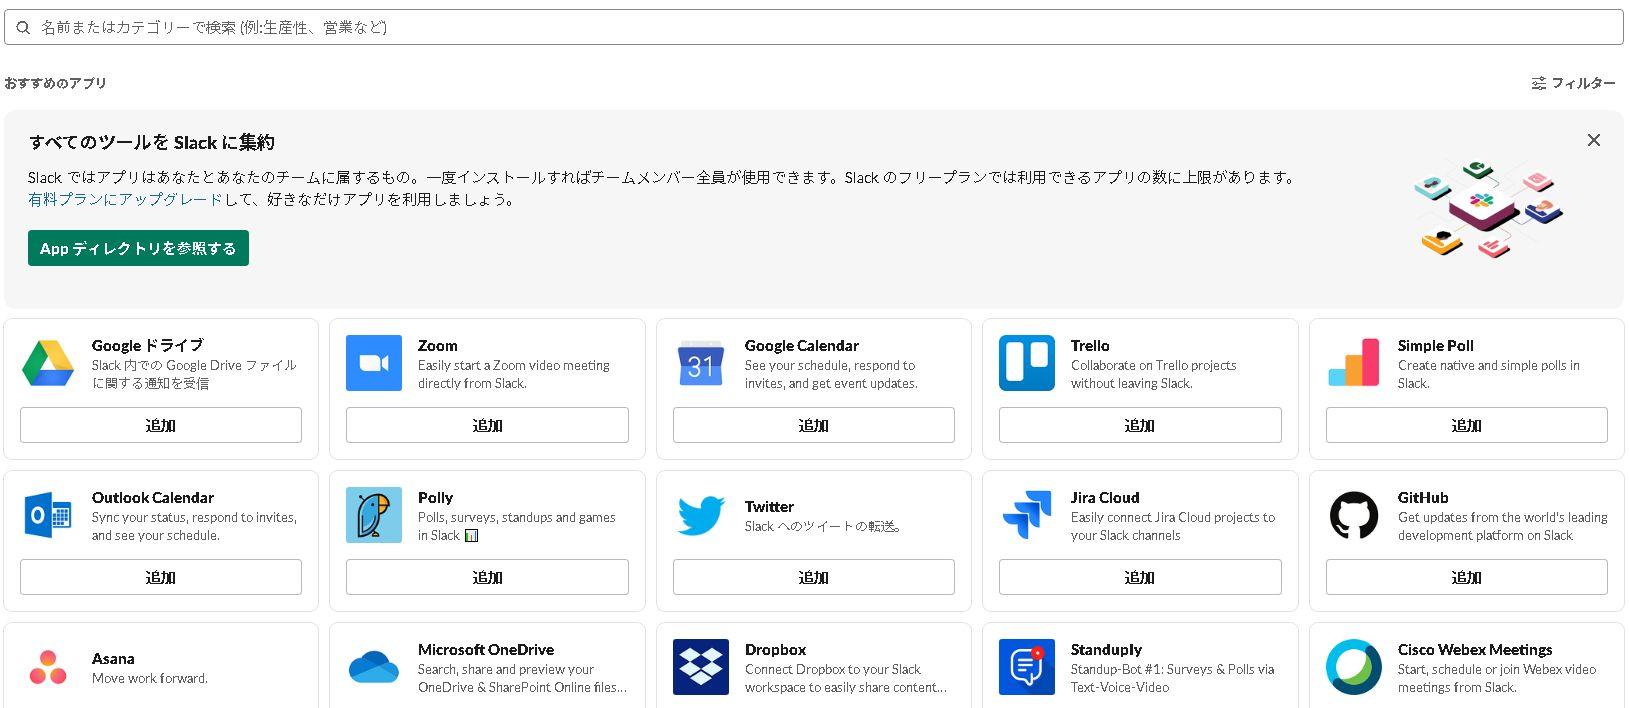 Slackの外部連携選択画面